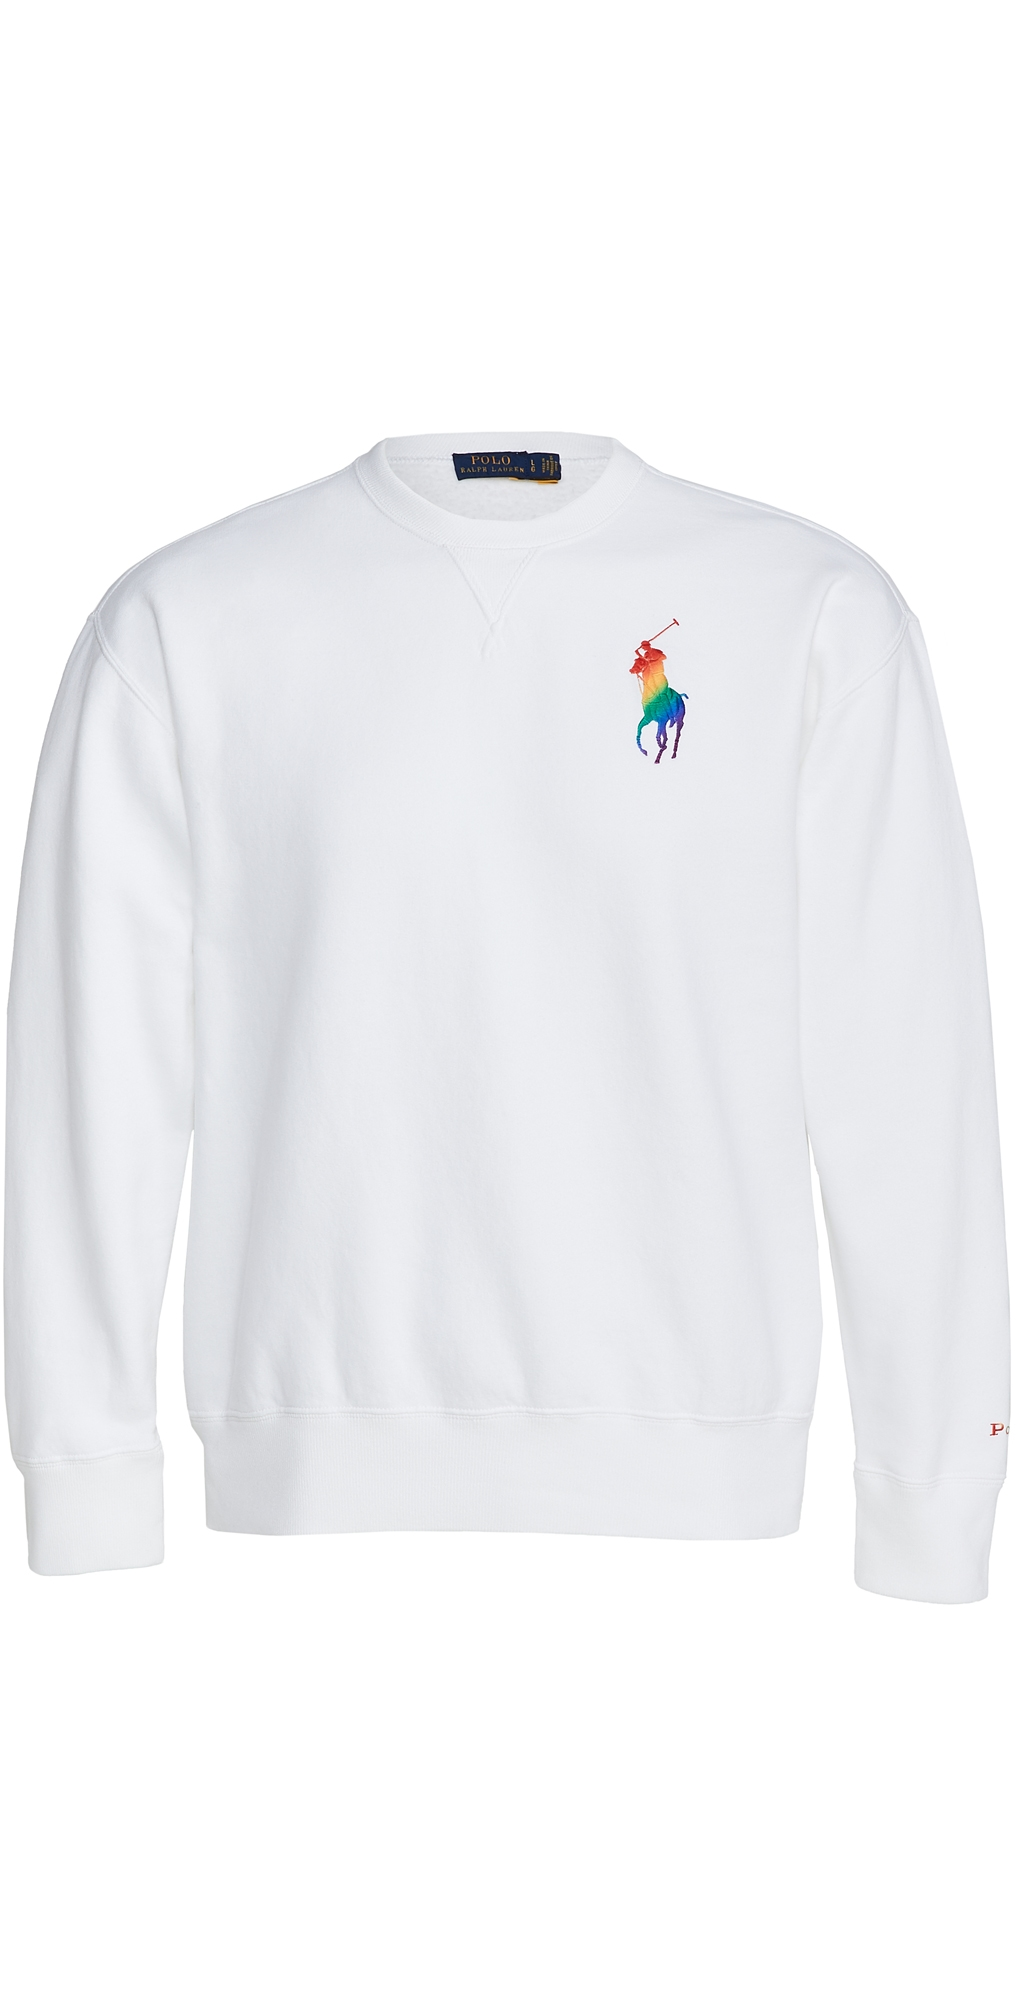 Polo Ralph Lauren Long Sleeve Pride Sweatshirt